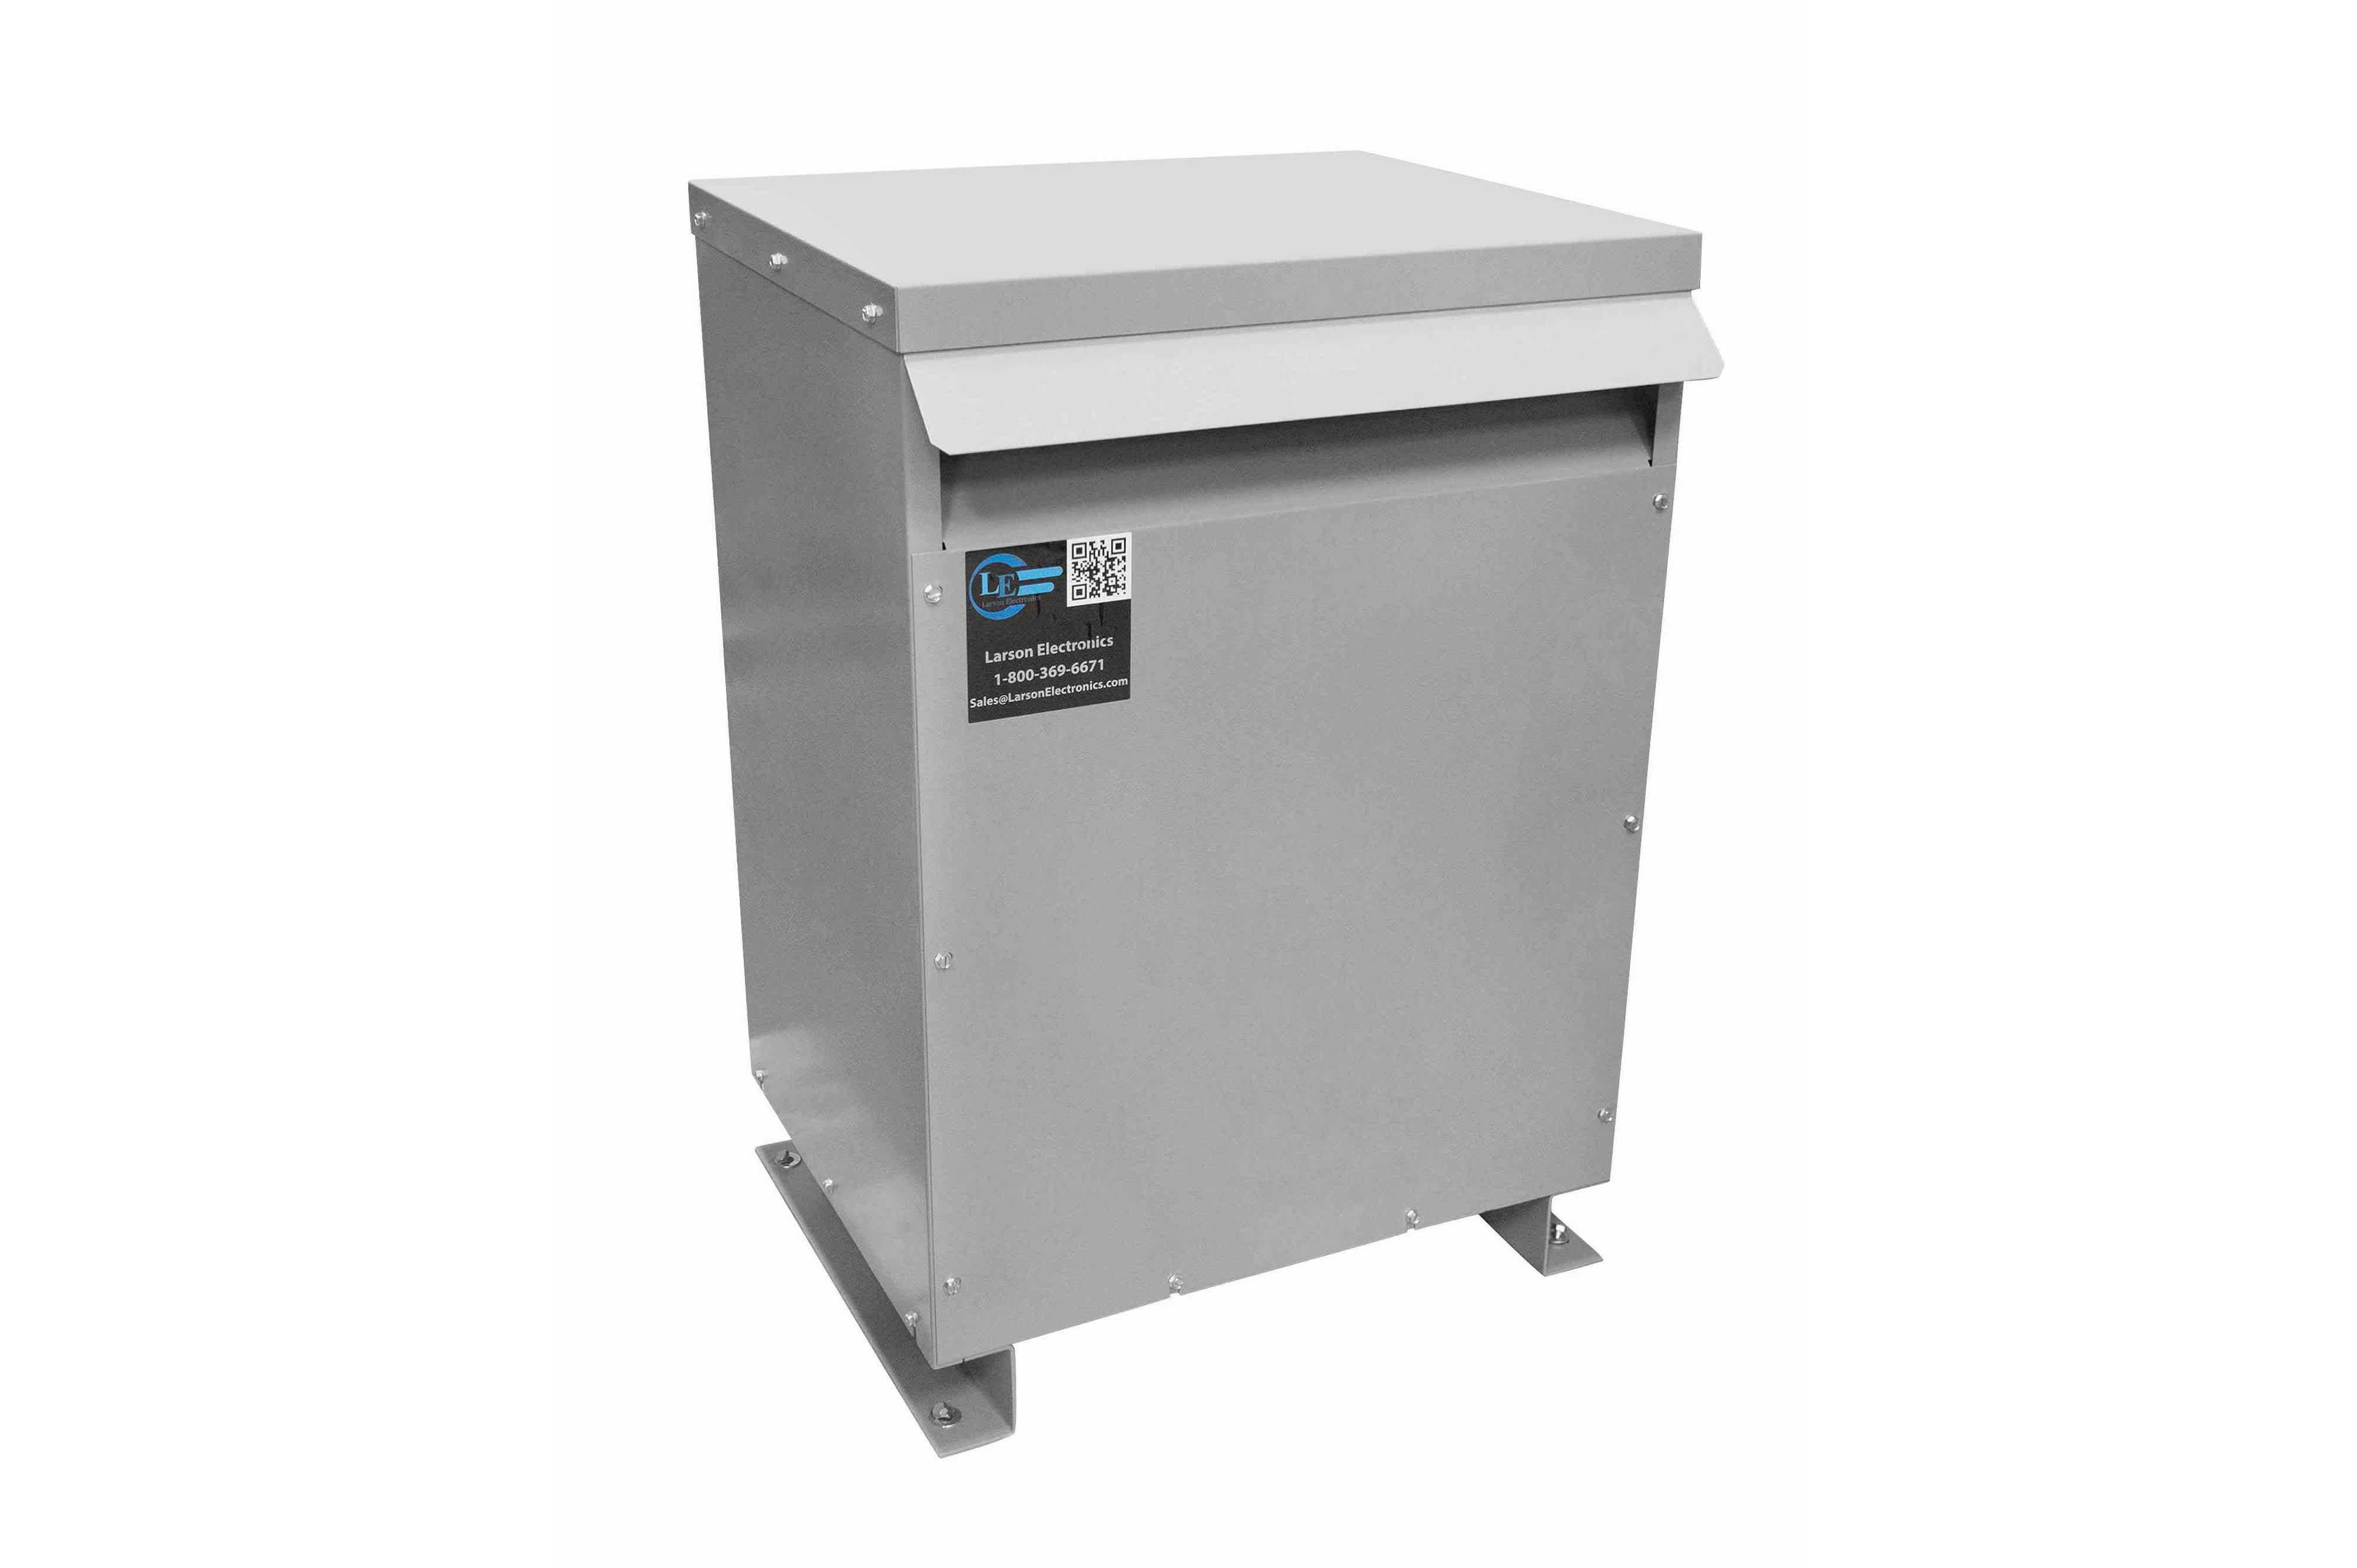 25 kVA 3PH DOE Transformer, 240V Delta Primary, 415Y/240 Wye-N Secondary, N3R, Ventilated, 60 Hz